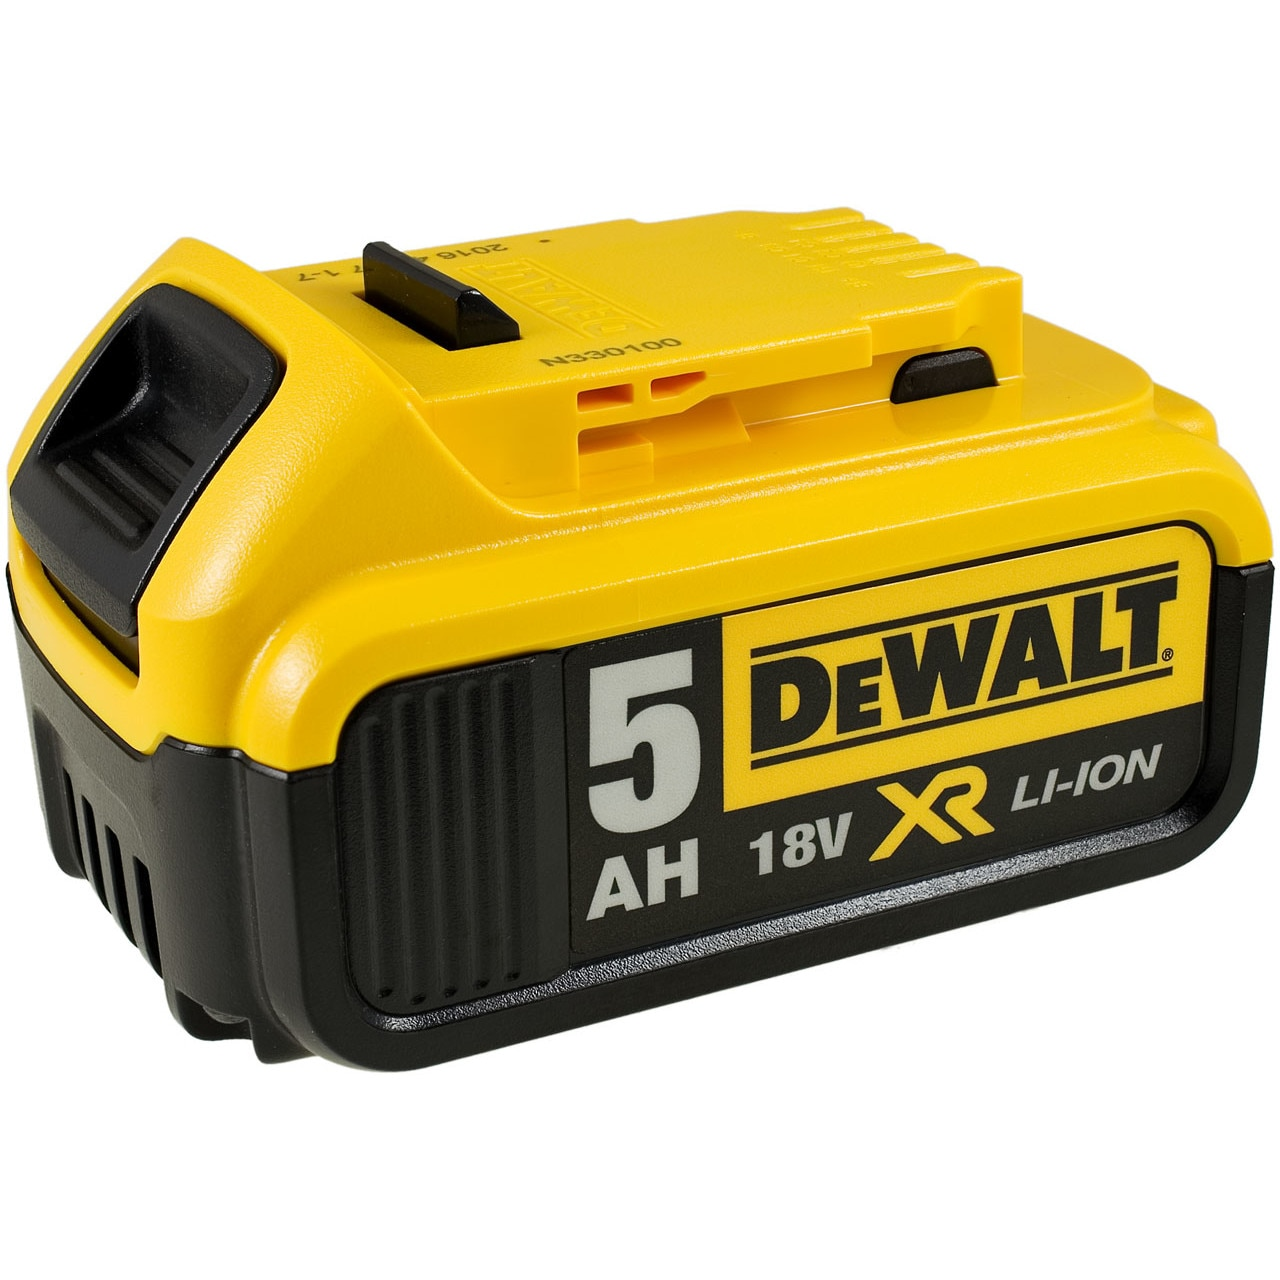 Acumulator original Dewalt model DCB184 18V 5,0Ah Li-Ion - eMAG.ro